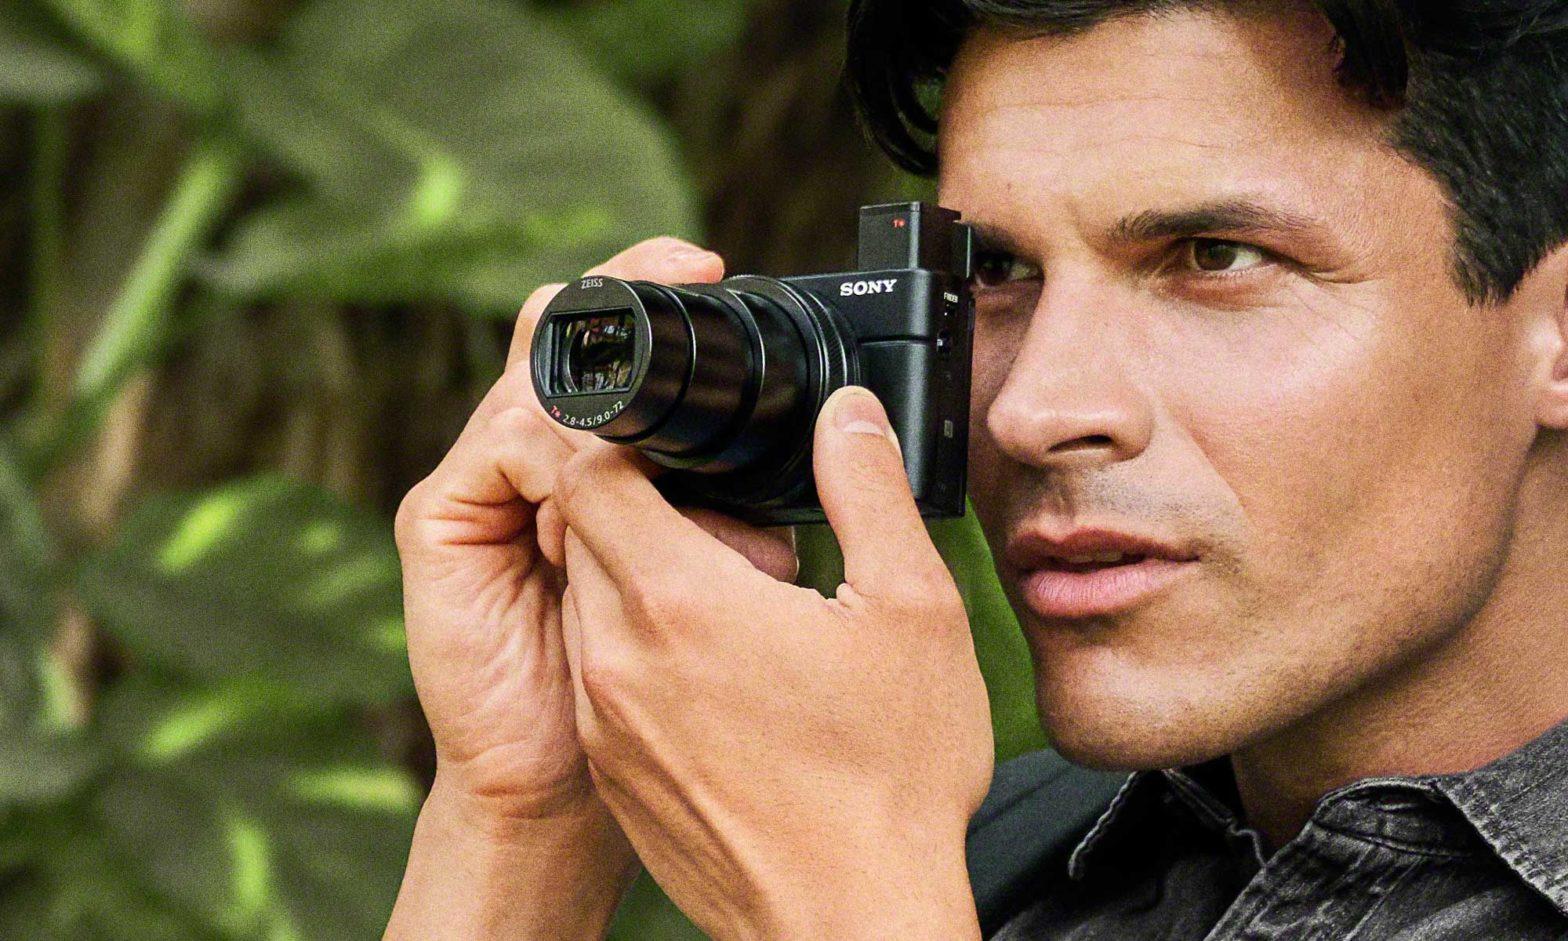 Sony Cyber-shot RX100 VII Camera